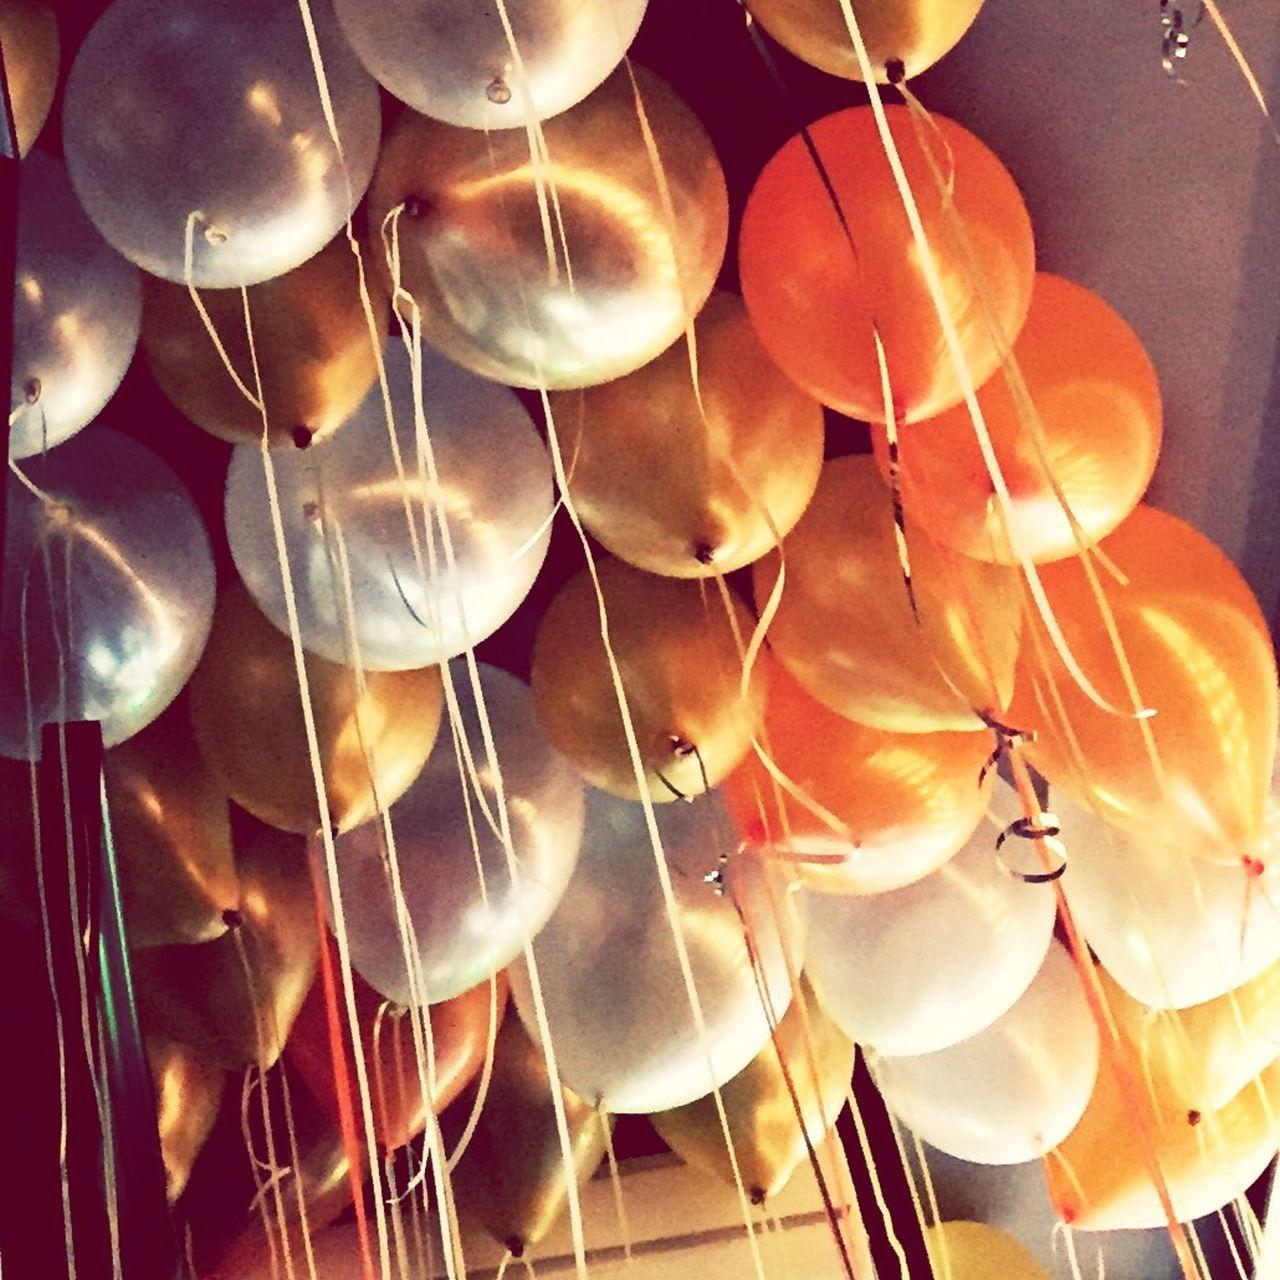 Make Magic Happen Balloons Orange Zoom In